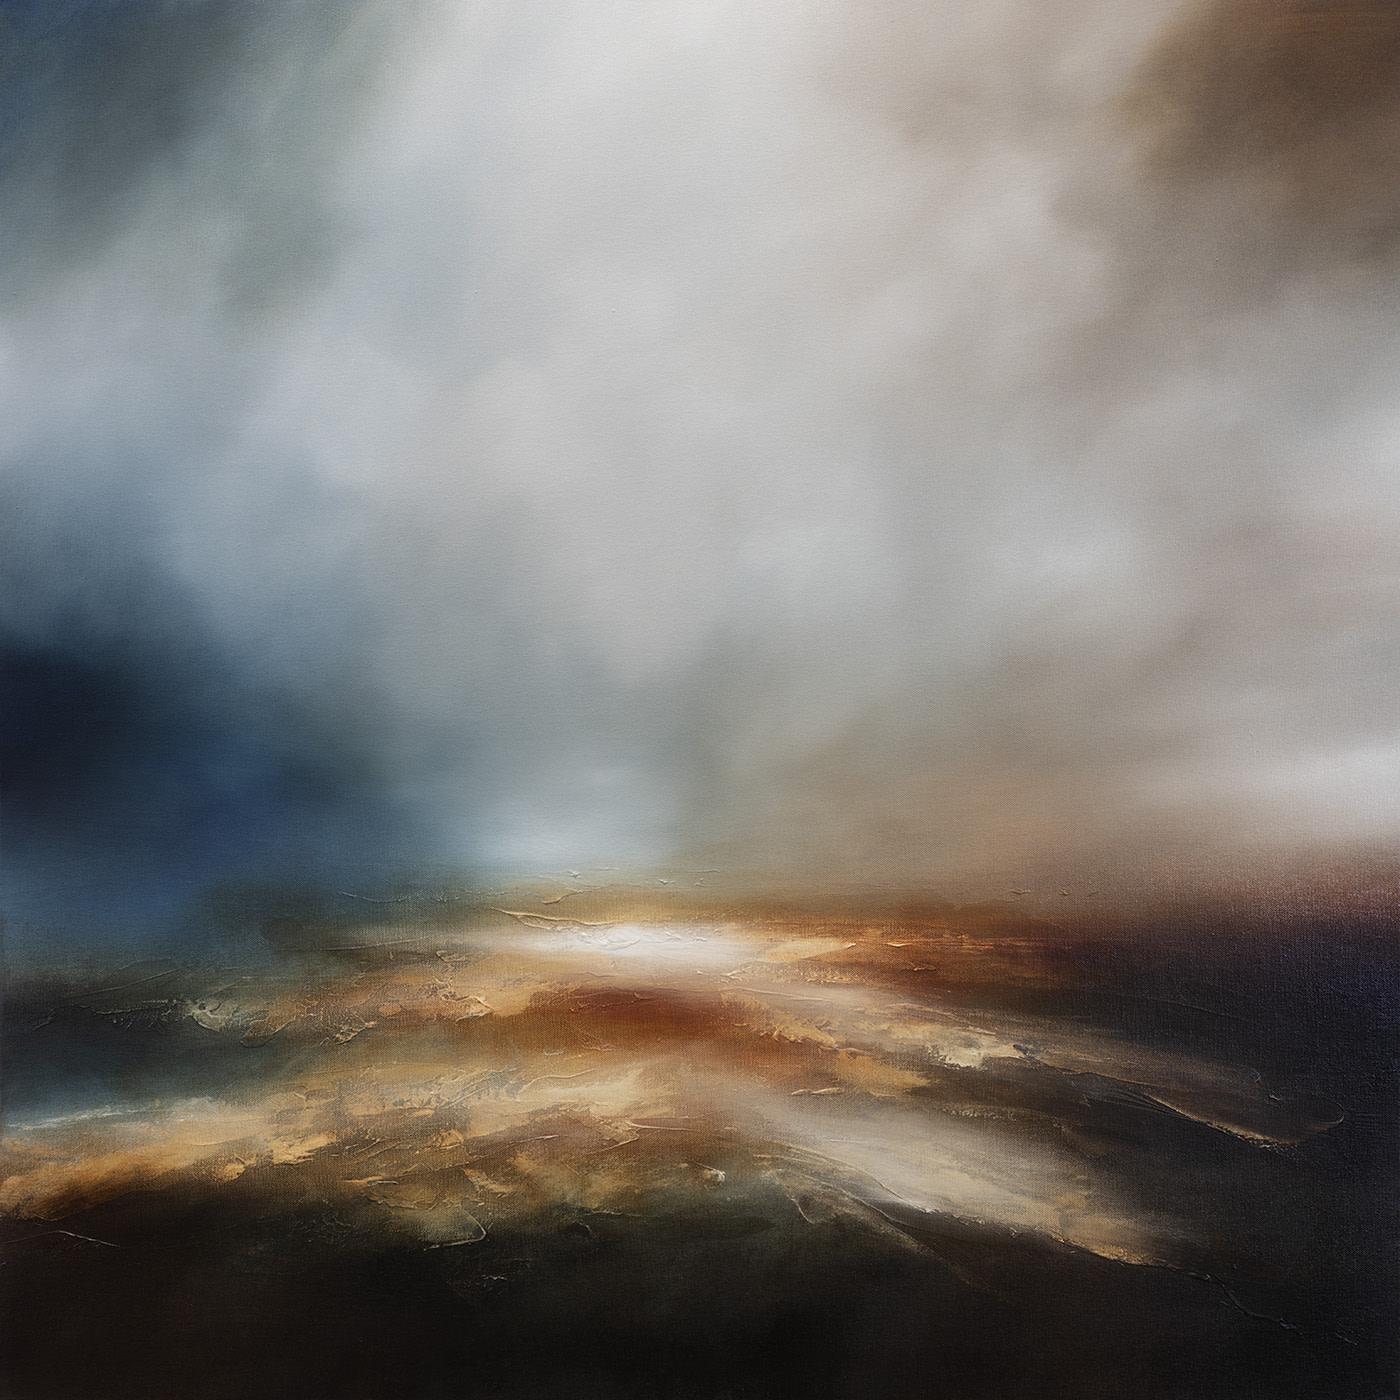 "<span class=""link fancybox-details-link""><a href=""/artists/244-paul-bennett/works/7241-paul-bennett-within-distant-lands-2020/"">View Detail Page</a></span><div class=""artist""><strong>Paul Bennett</strong></div> b. 1975 <div class=""title""><em>Within Distant Lands</em>, 2020</div> <div class=""medium"">oil on deep edged canvas</div> <div class=""dimensions"">h. 100 x w. 100 cm</div><div class=""price"">£2,250.00</div><div class=""copyright_line"">Ownart: £225 x 10 Months, 0% APR</div>"